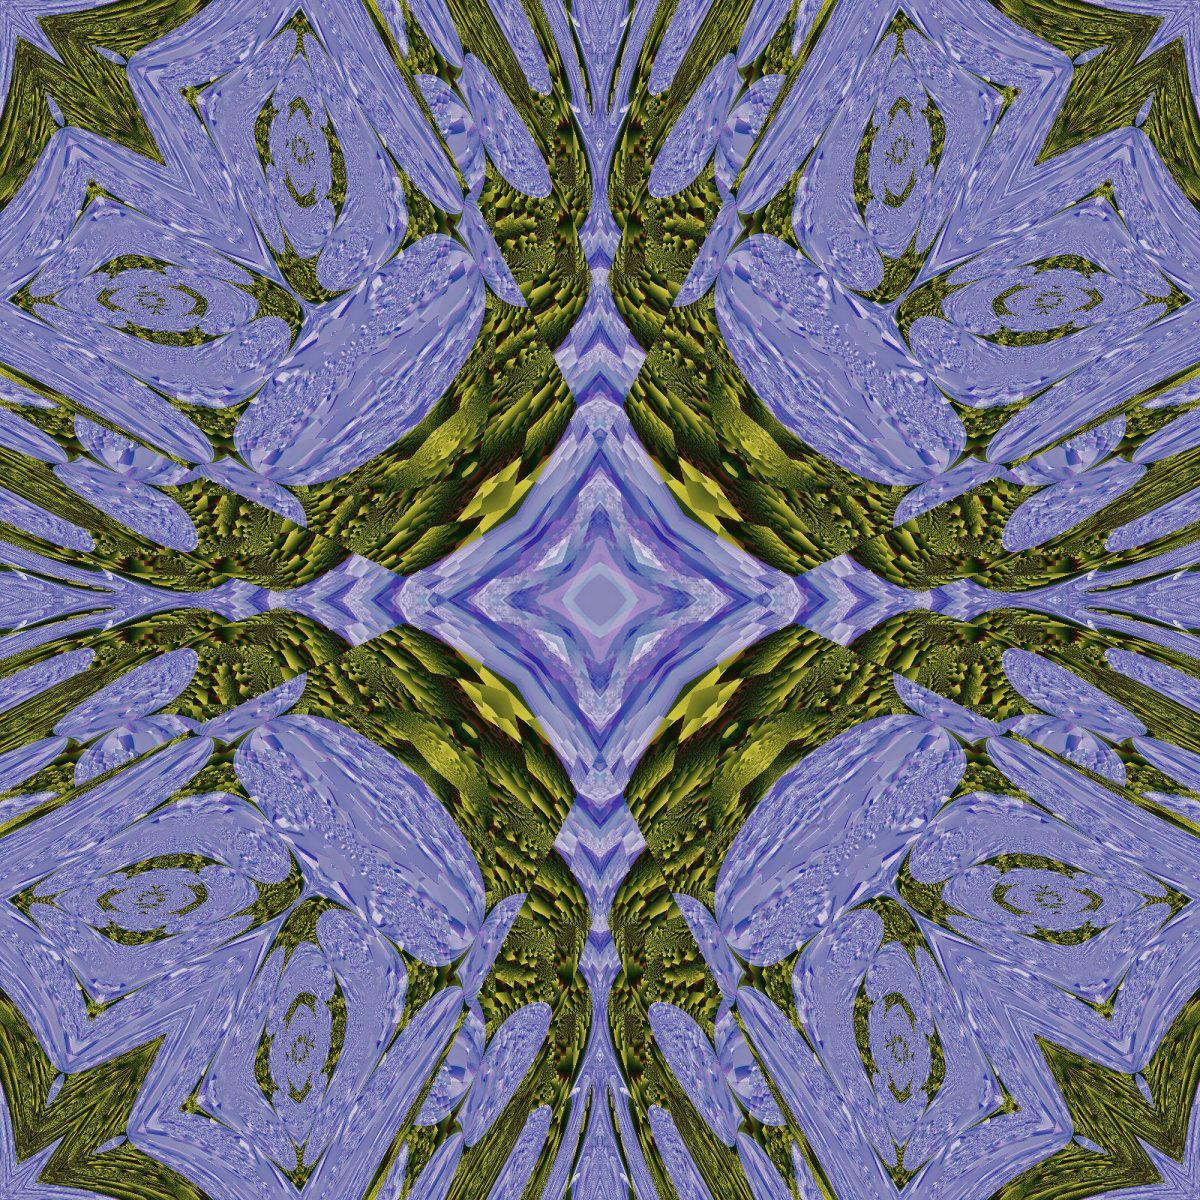 glass island weave by scottVee